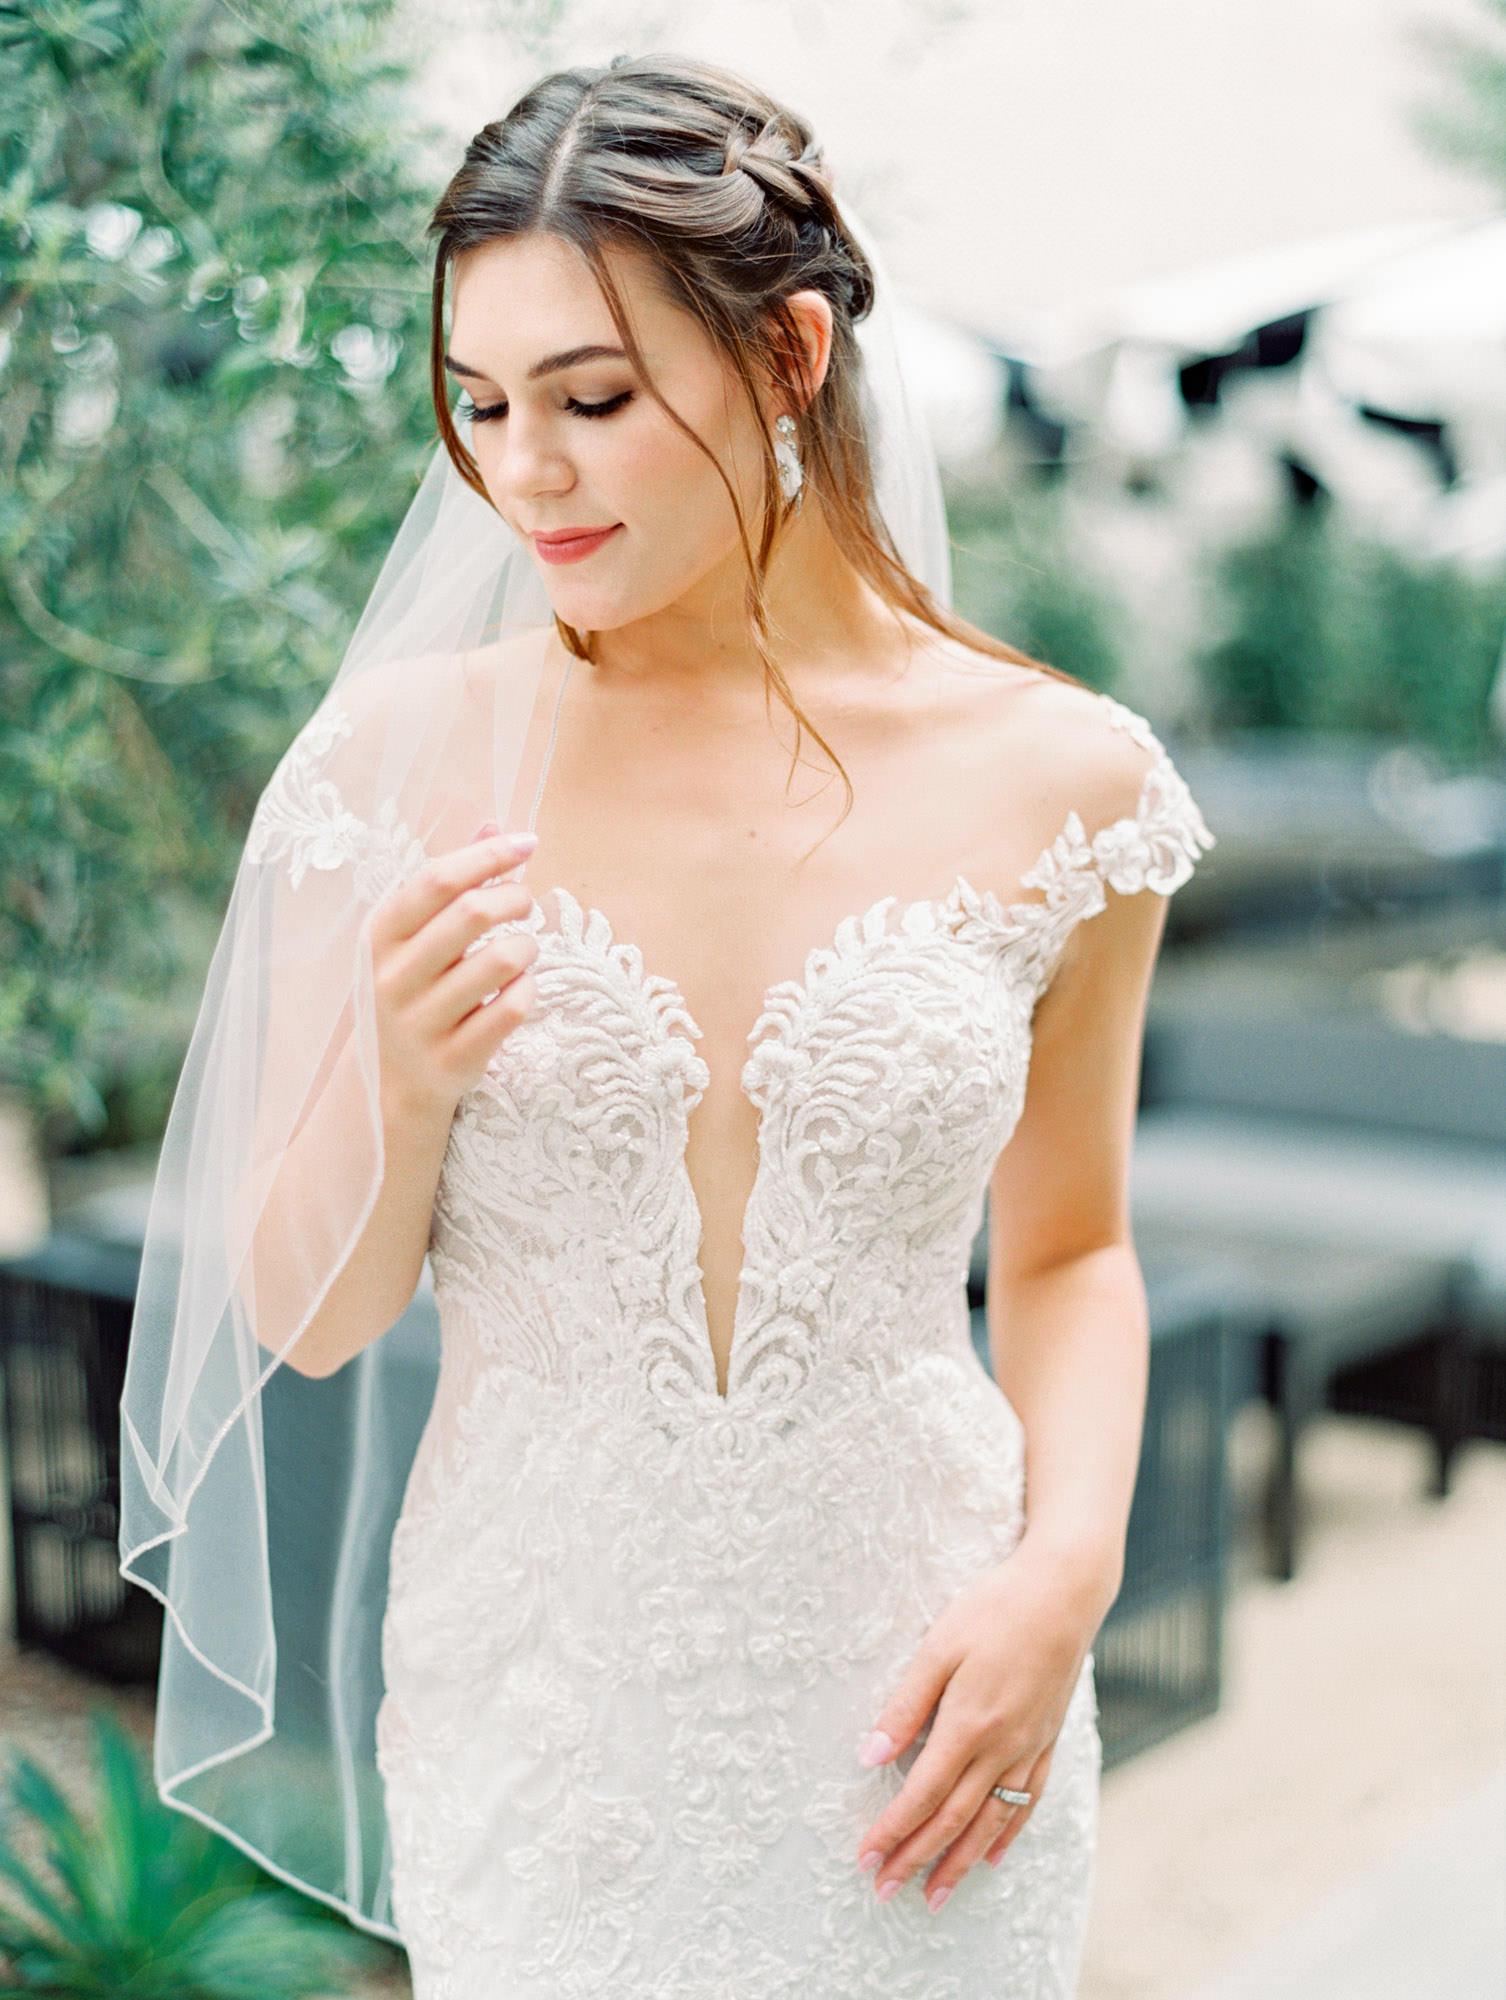 1104 cap sleeve dress with floral lace Martina Liana wedding dress in San Diego by Cavin Elizabeth - San Diego film photographer. Wedding Fashion Inspiration.